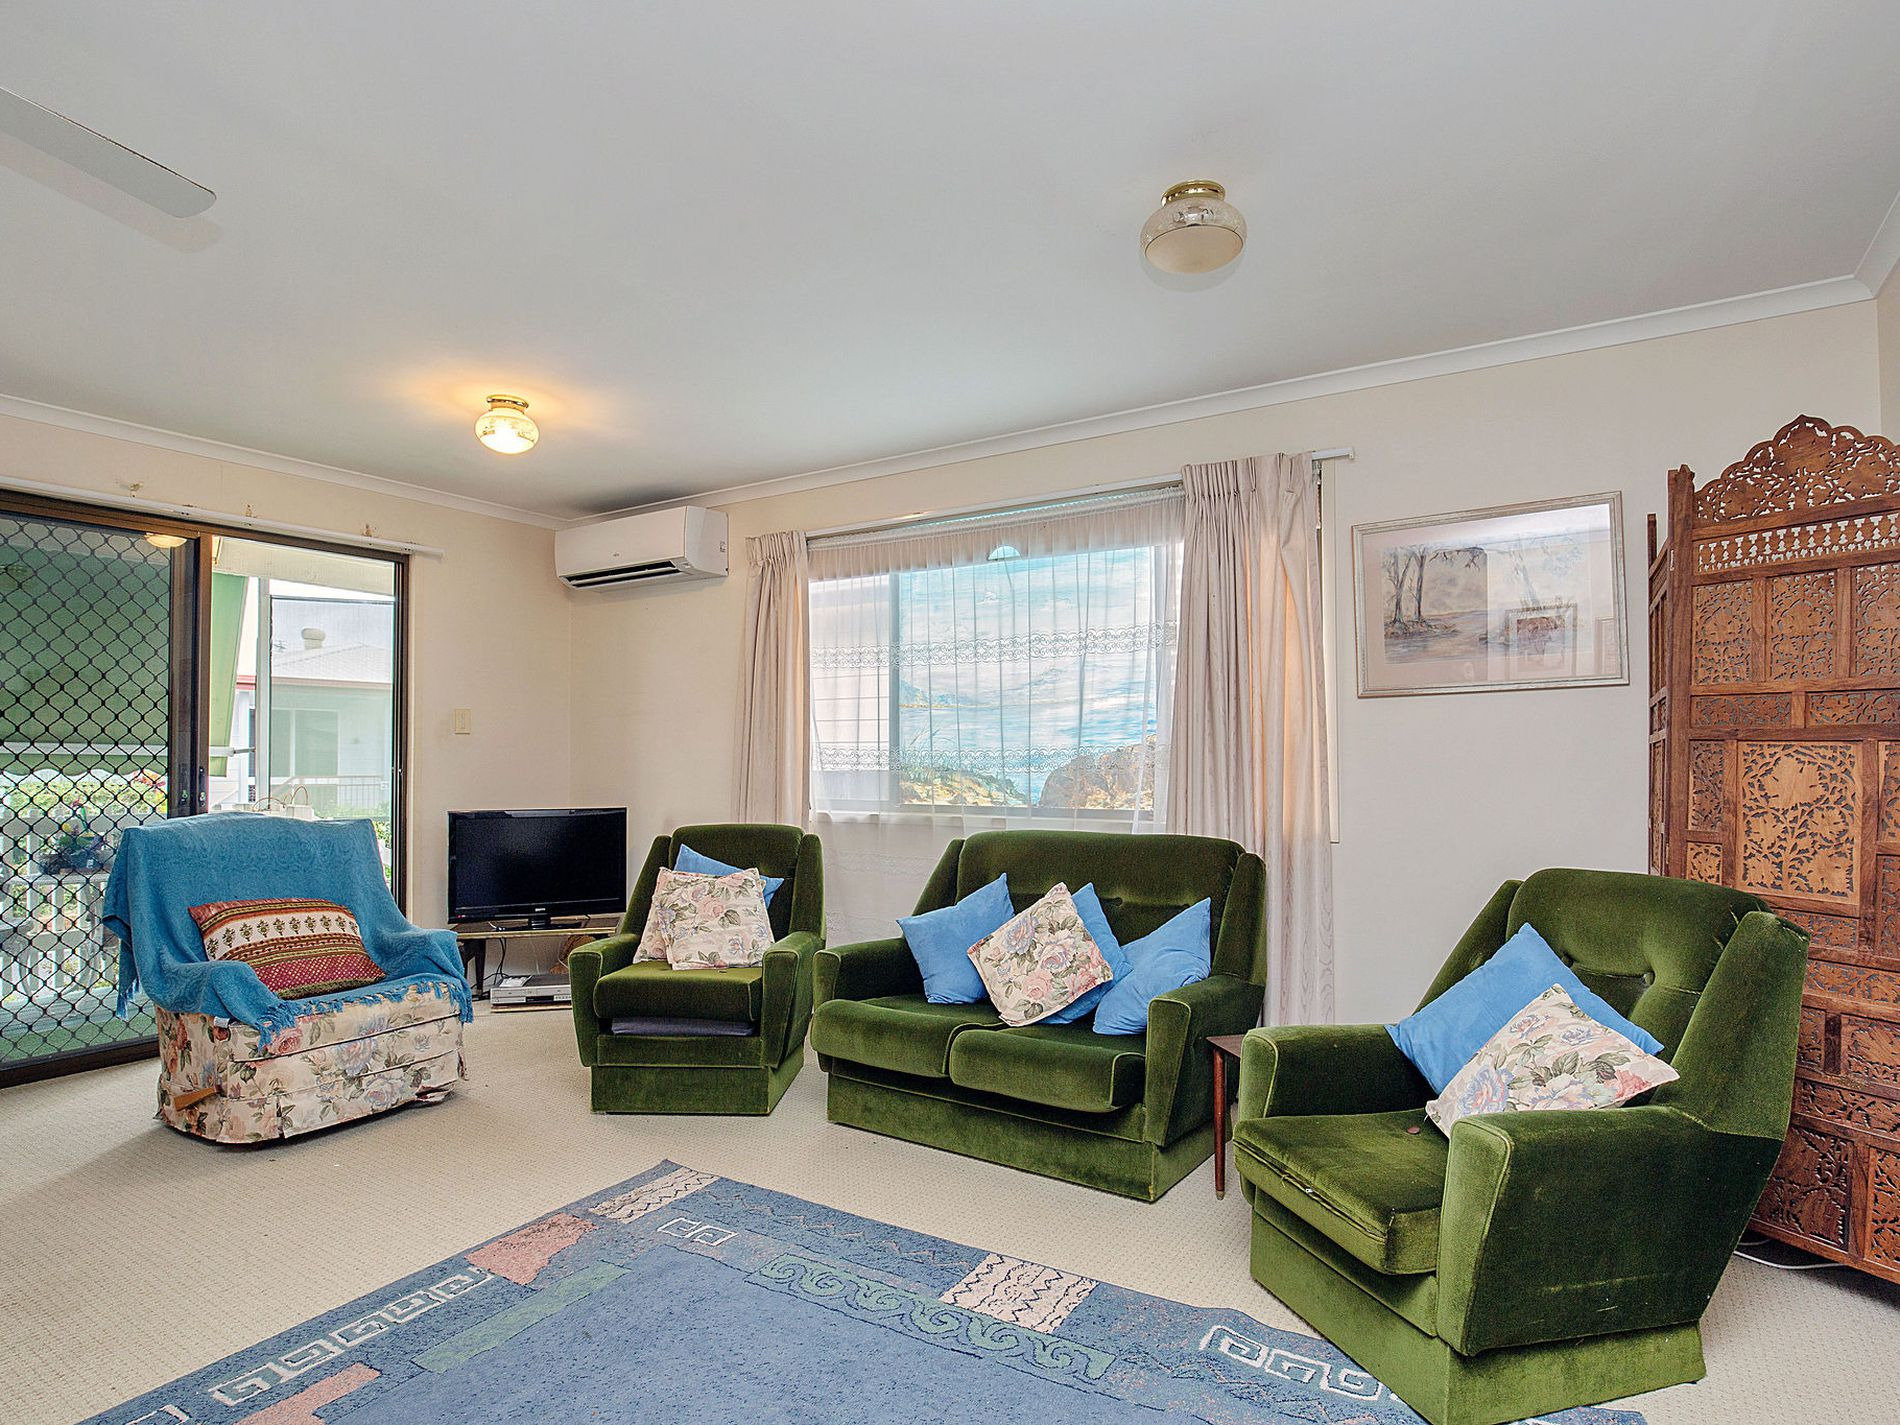 217 / 22 'Gateway Living' Hansford Road, Coombabah